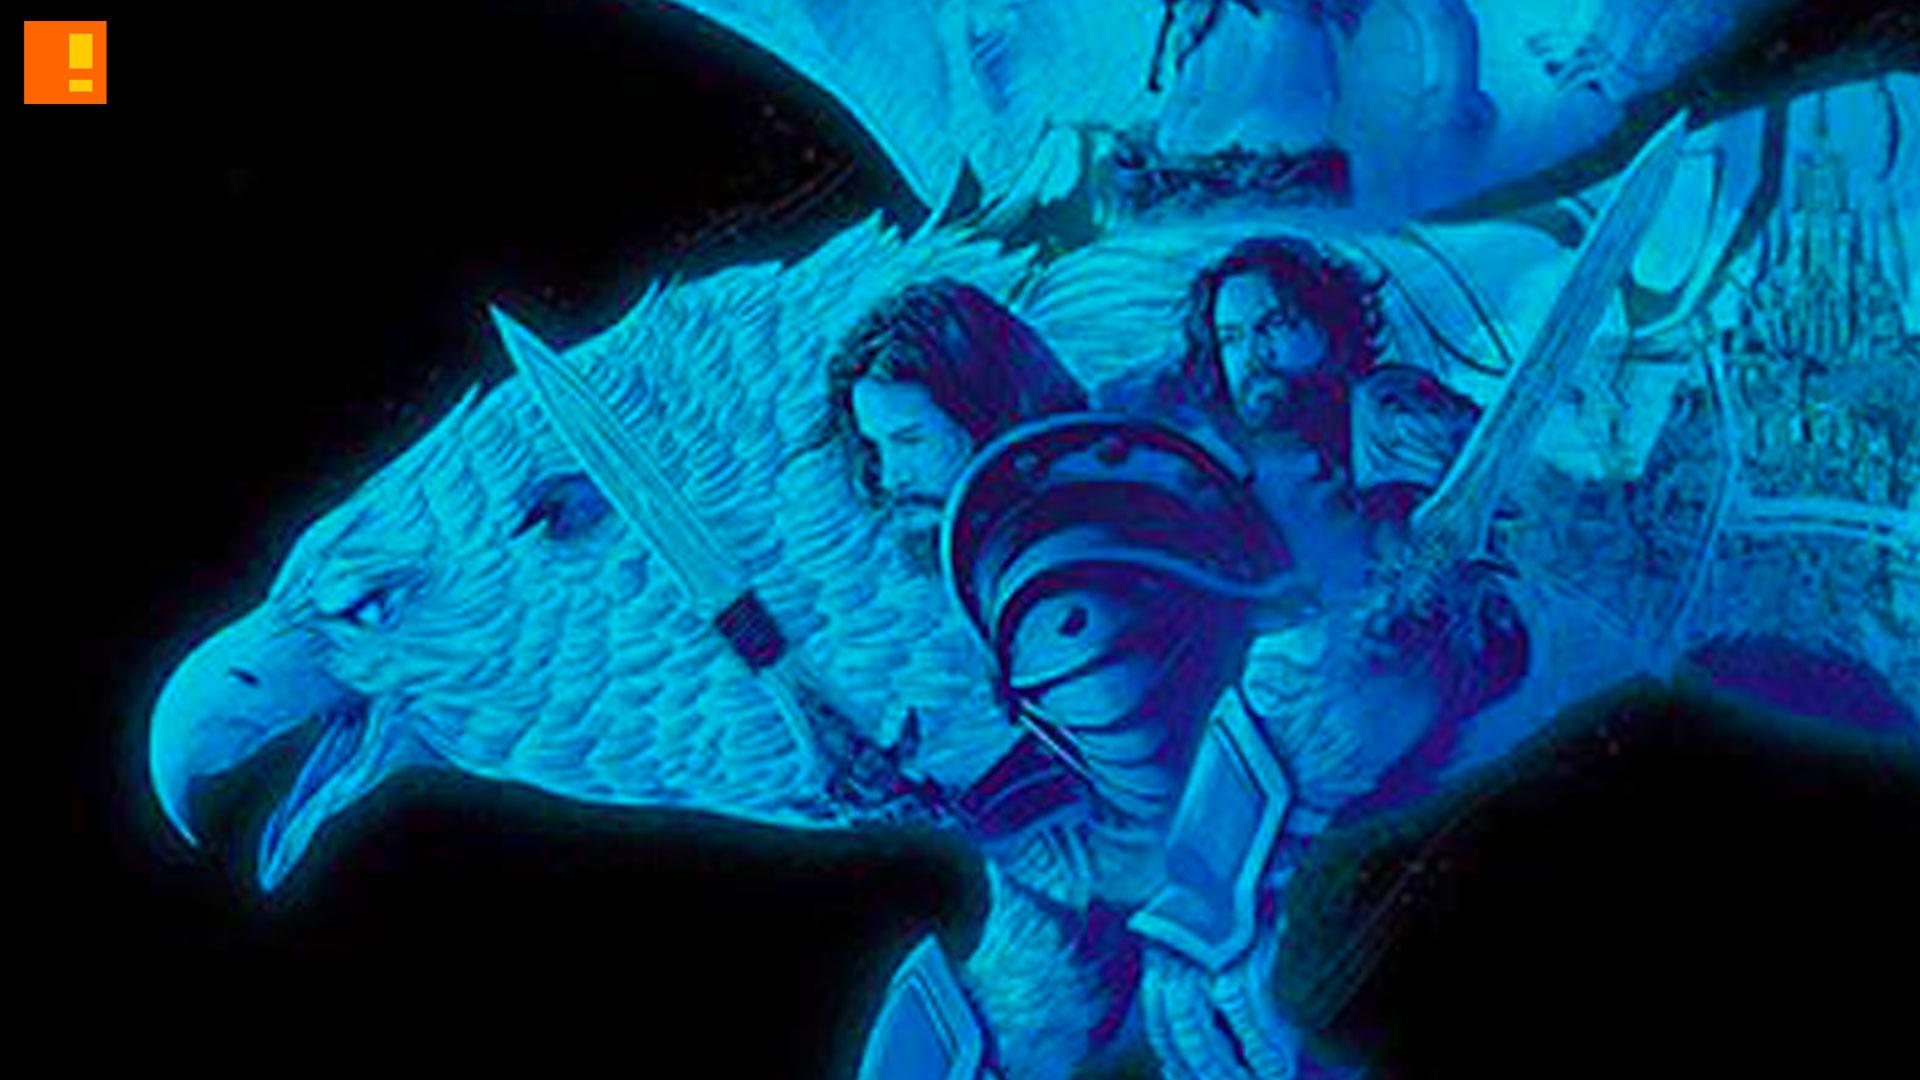 Warcraft, Bonds of Brotherhood, Legendary Comics, ,Blizzard ,Chis Metzen,Paul Cornell , Mat Broome, Michael O'Hare, Eddie Nunez, Roy Allan Martinez, Ale Garza, Mike Bowden